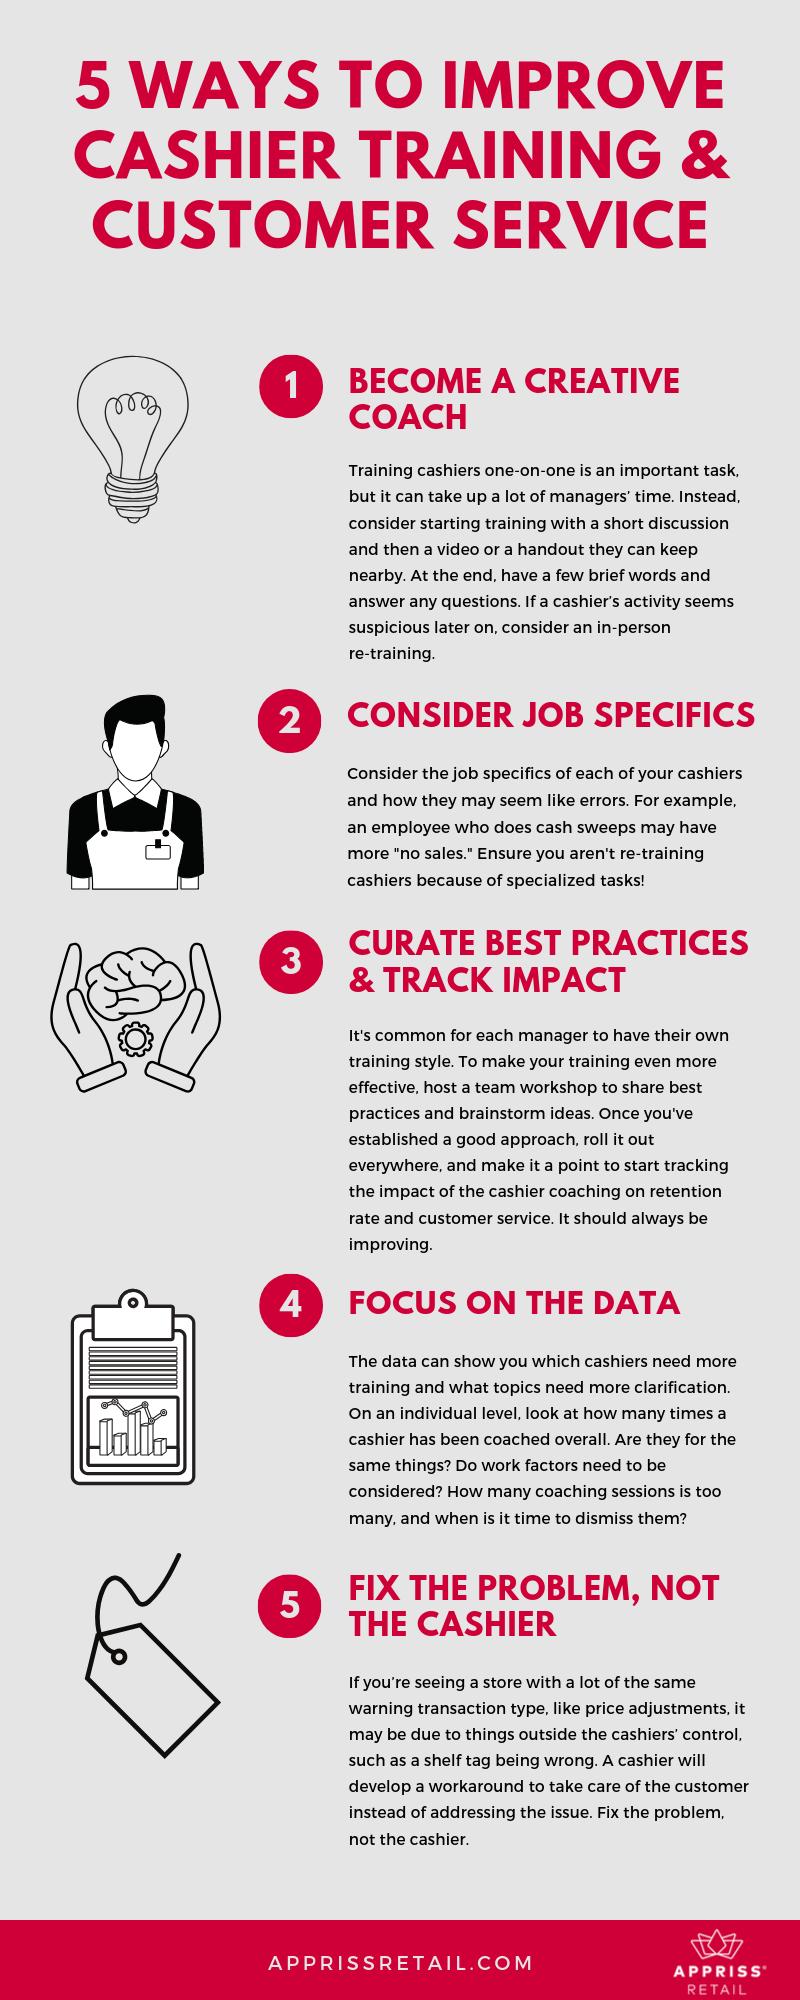 Infographic: 5 Ways to Improve Cashier Training & Customer Service